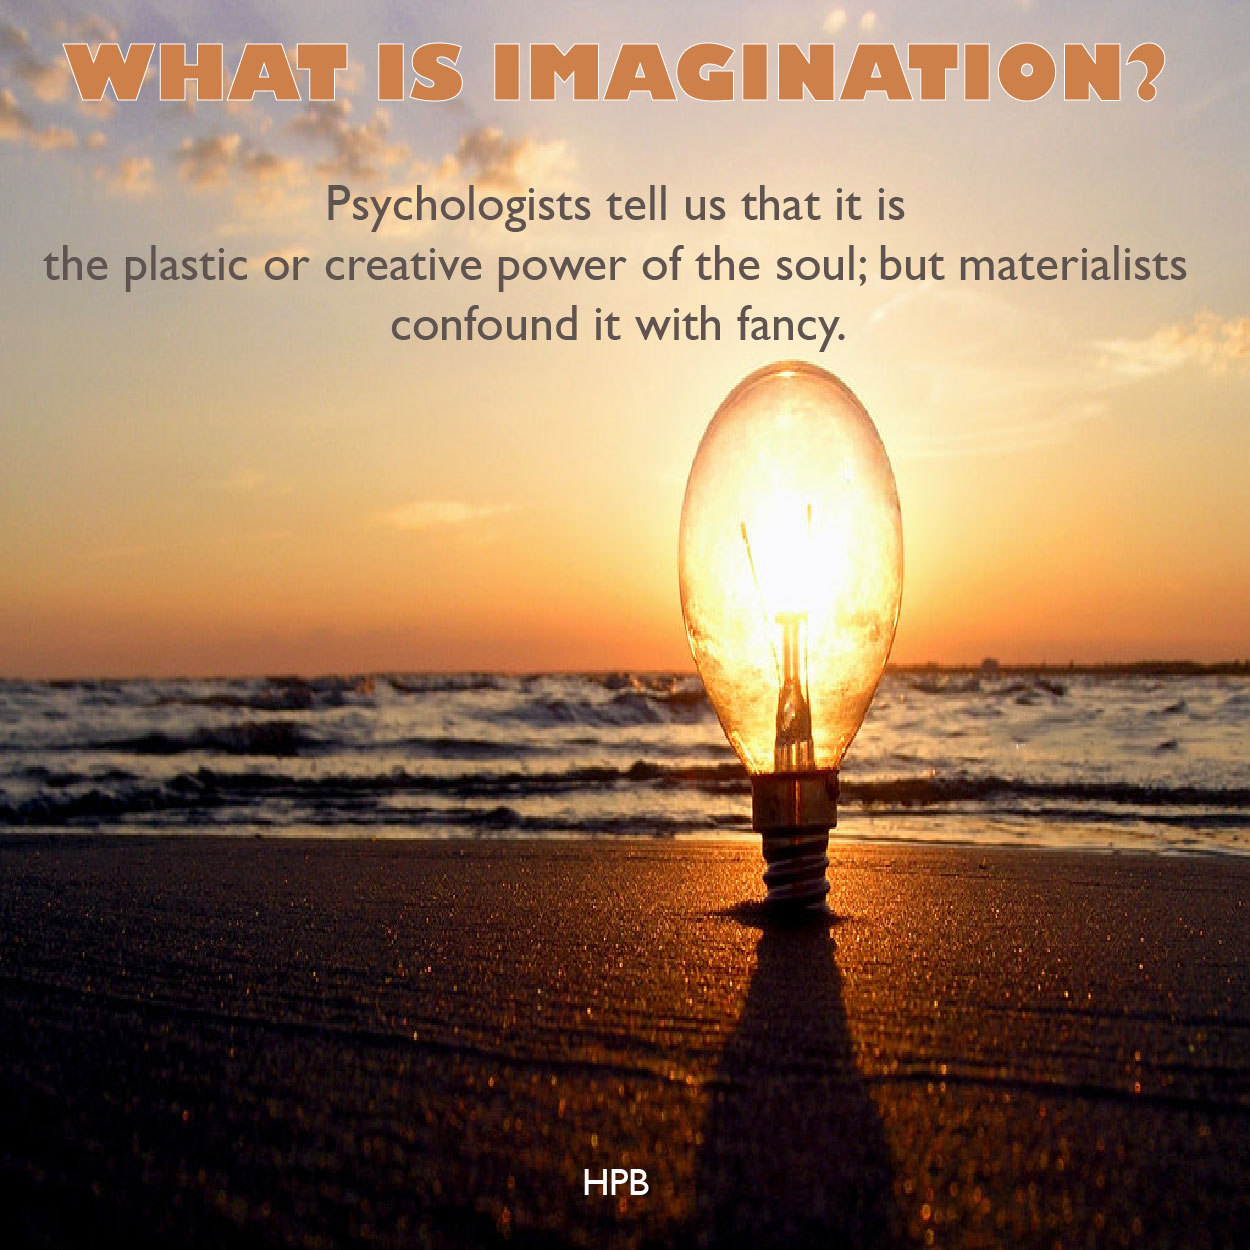 HPB.imagination